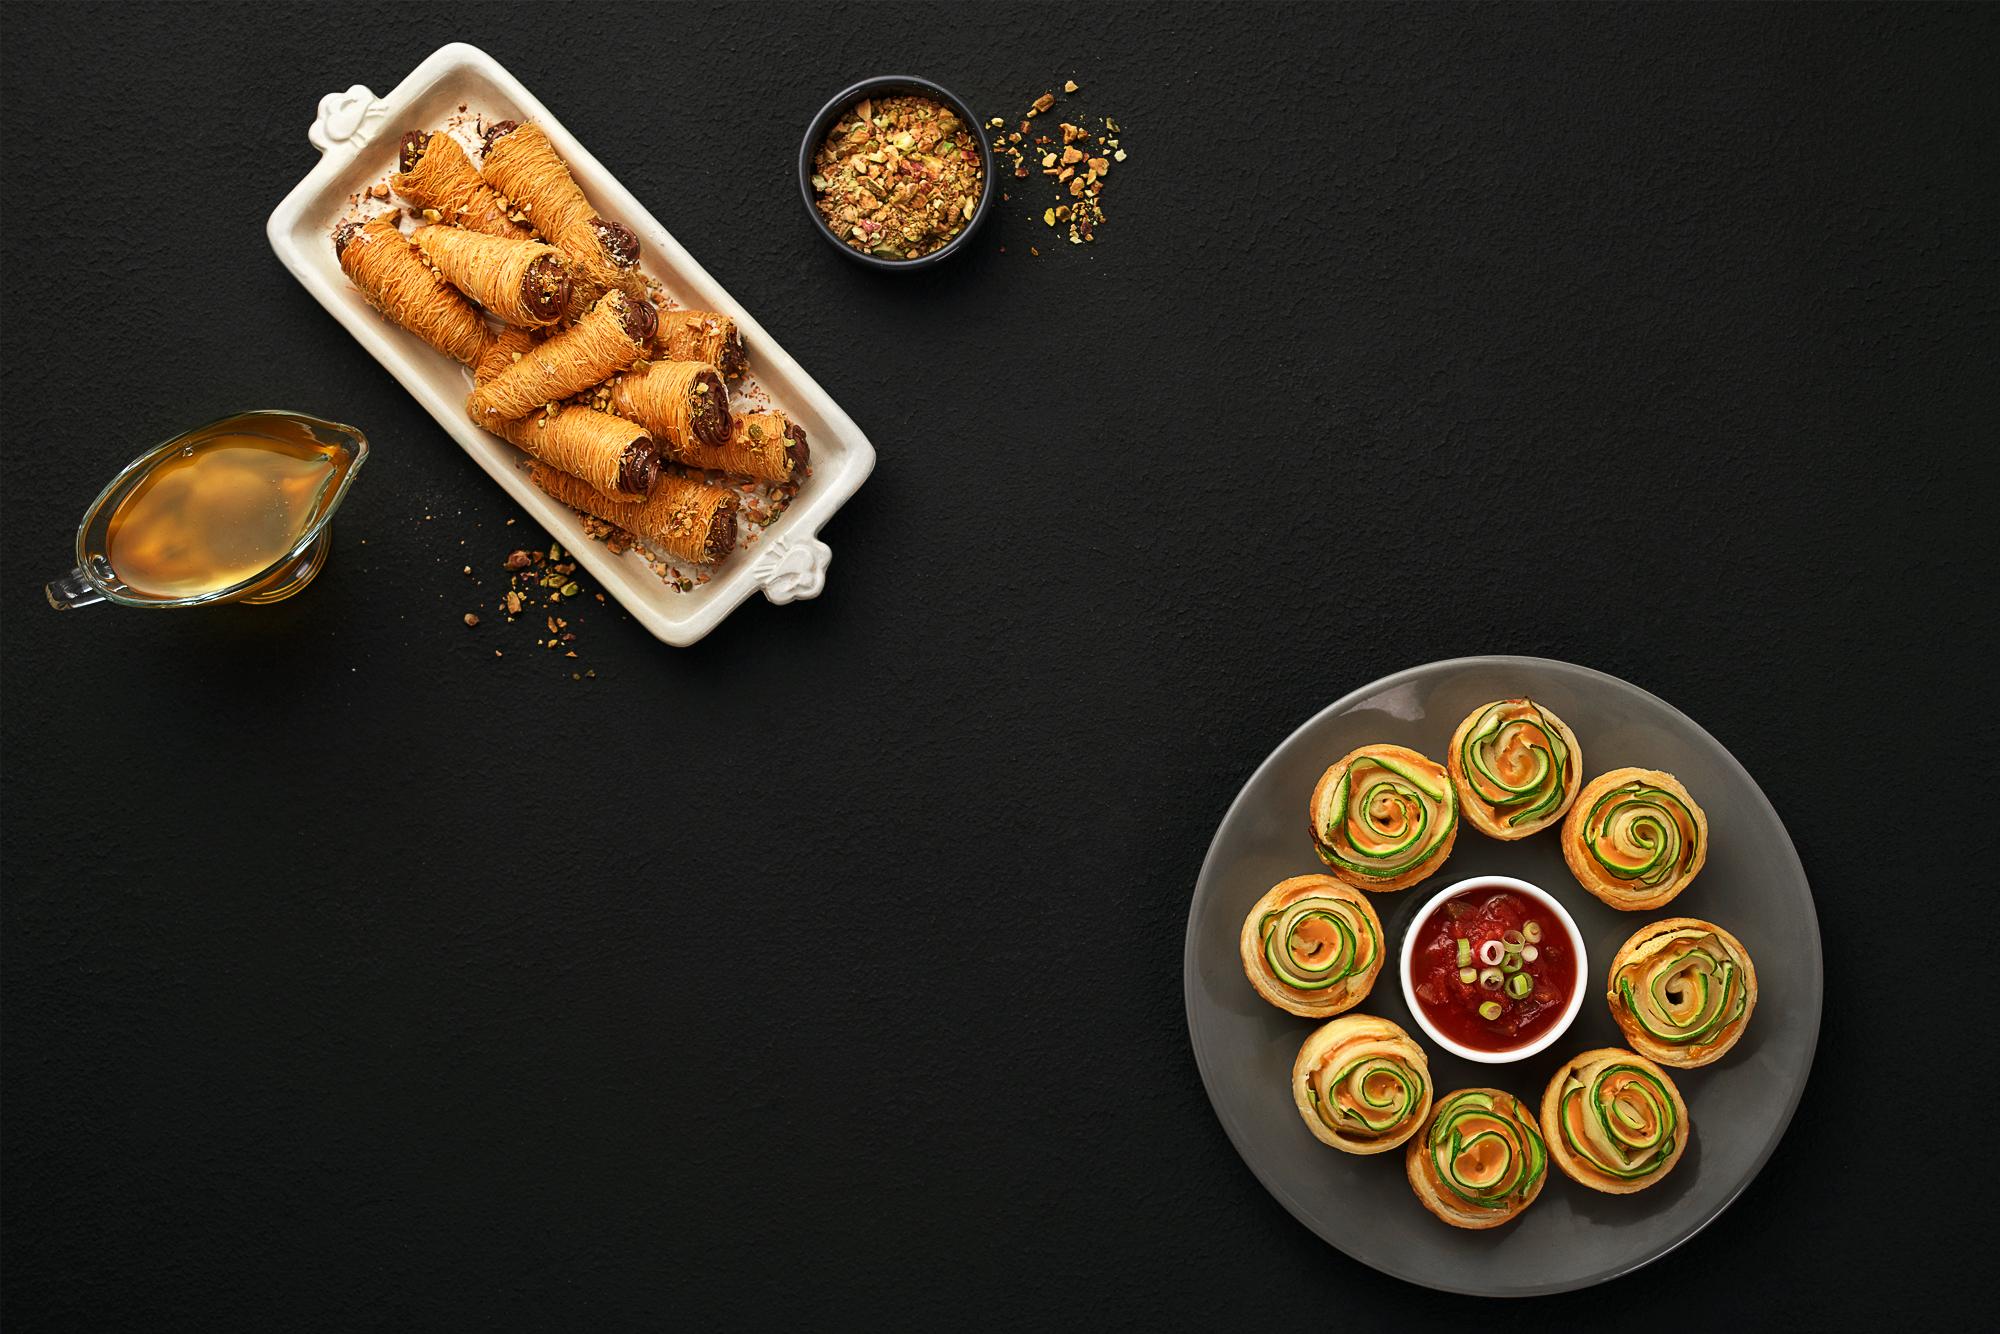 Konafa cones, chocolate, honey, nuts, puff pastry and red sauce